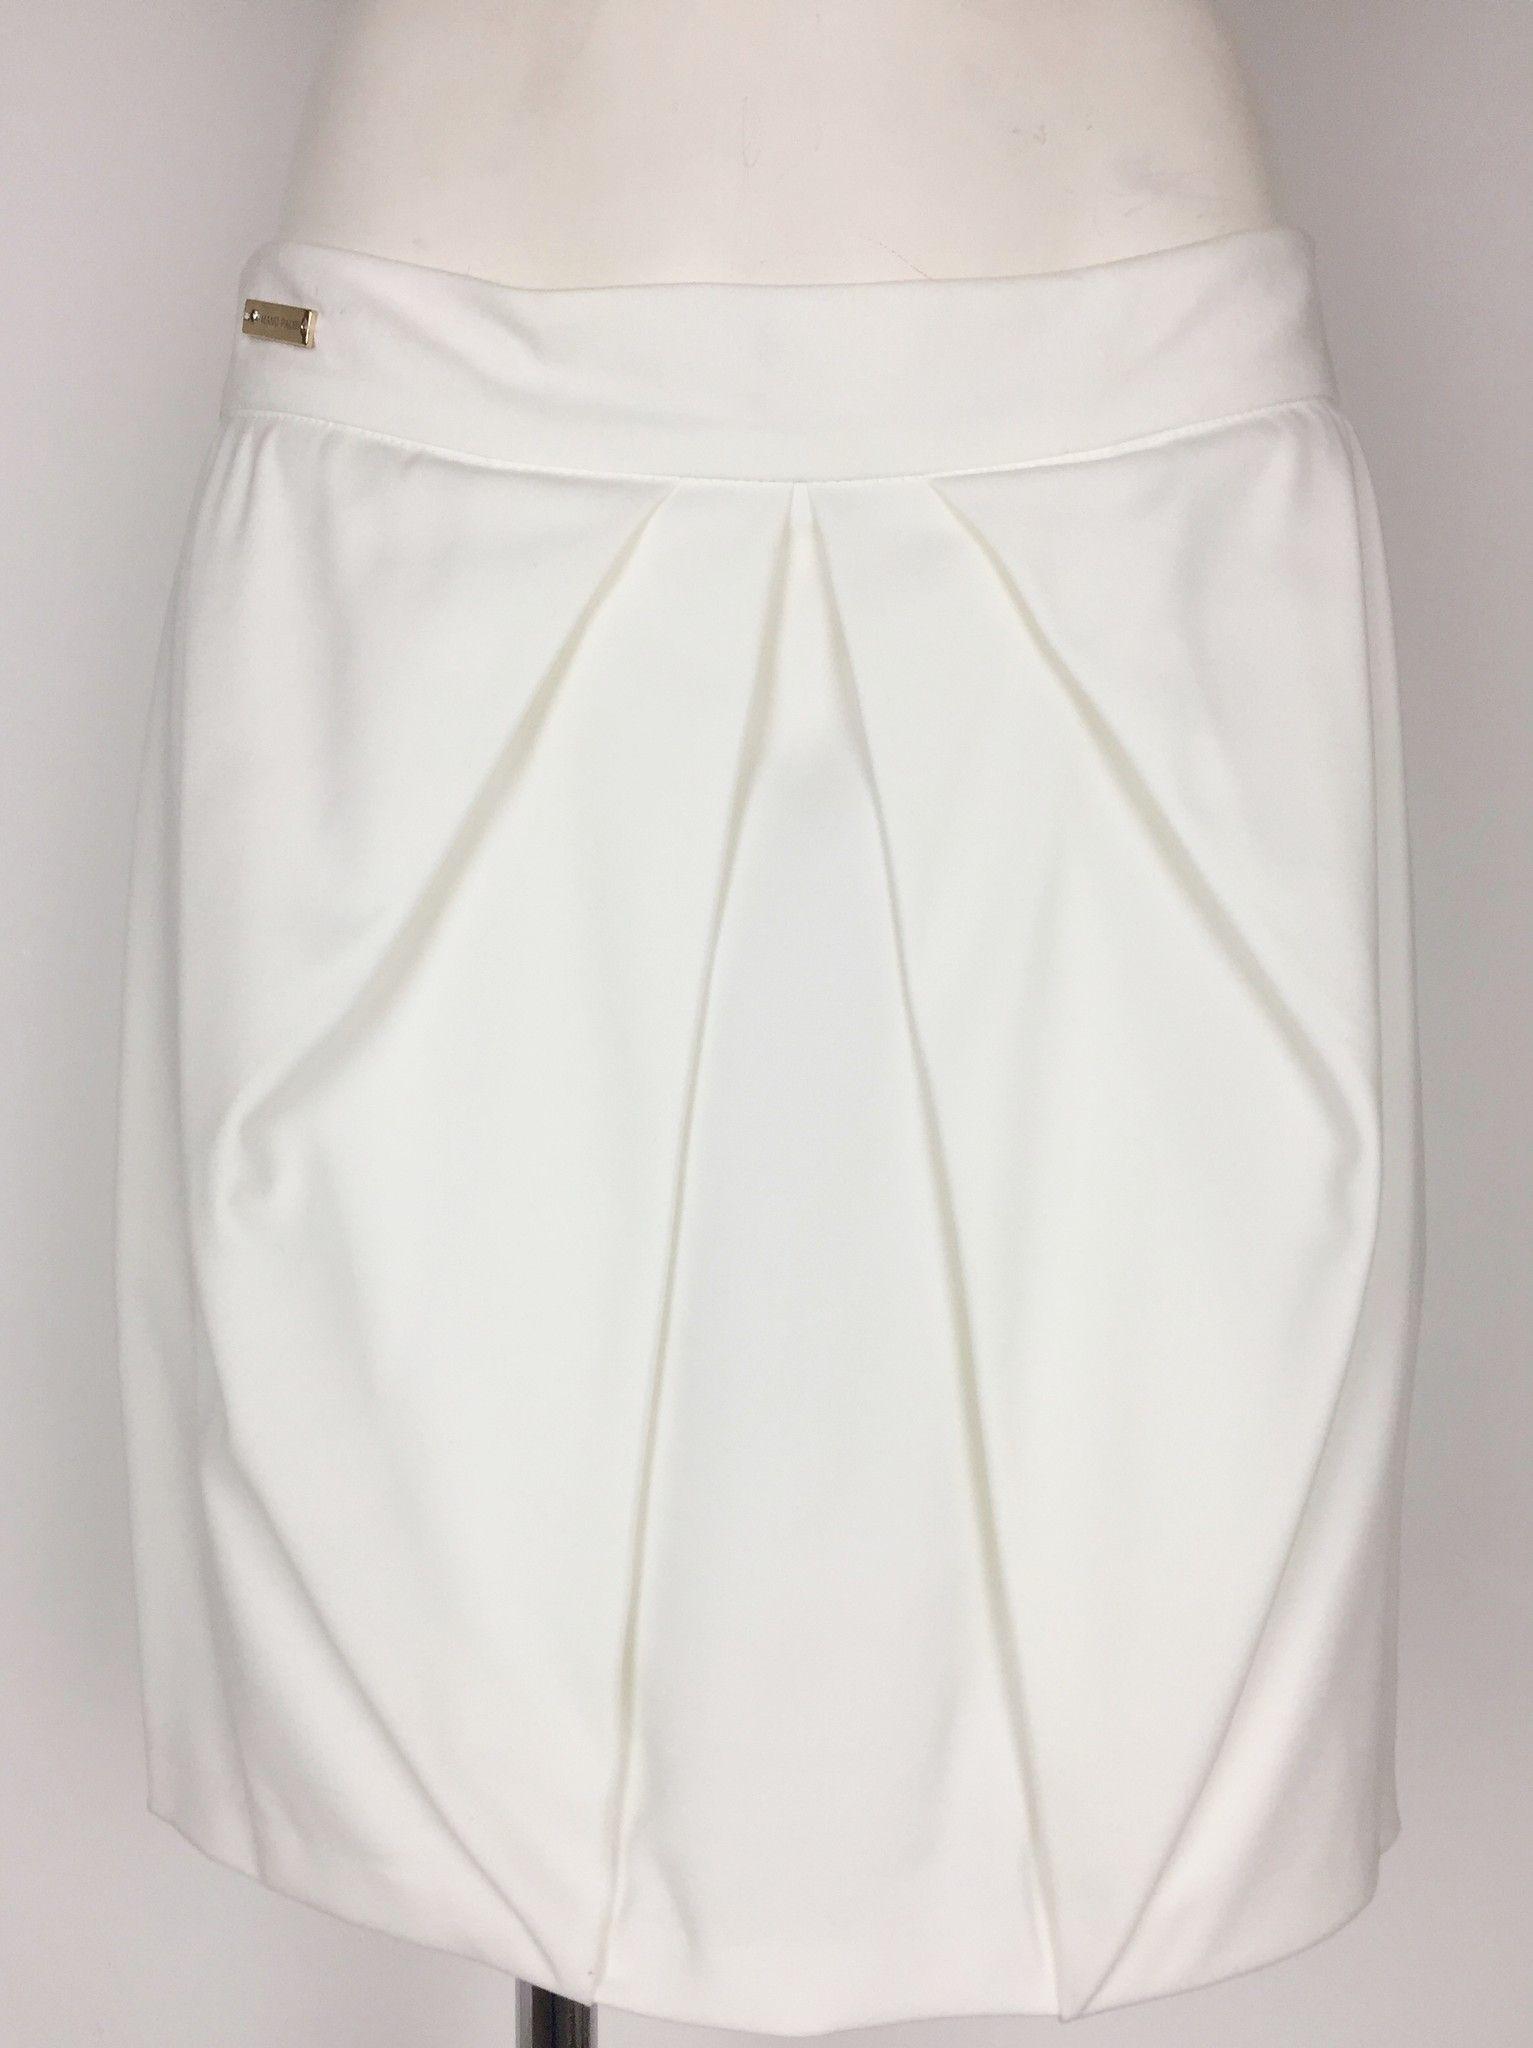 Manu Palmi Short Skirt Cod.240E158